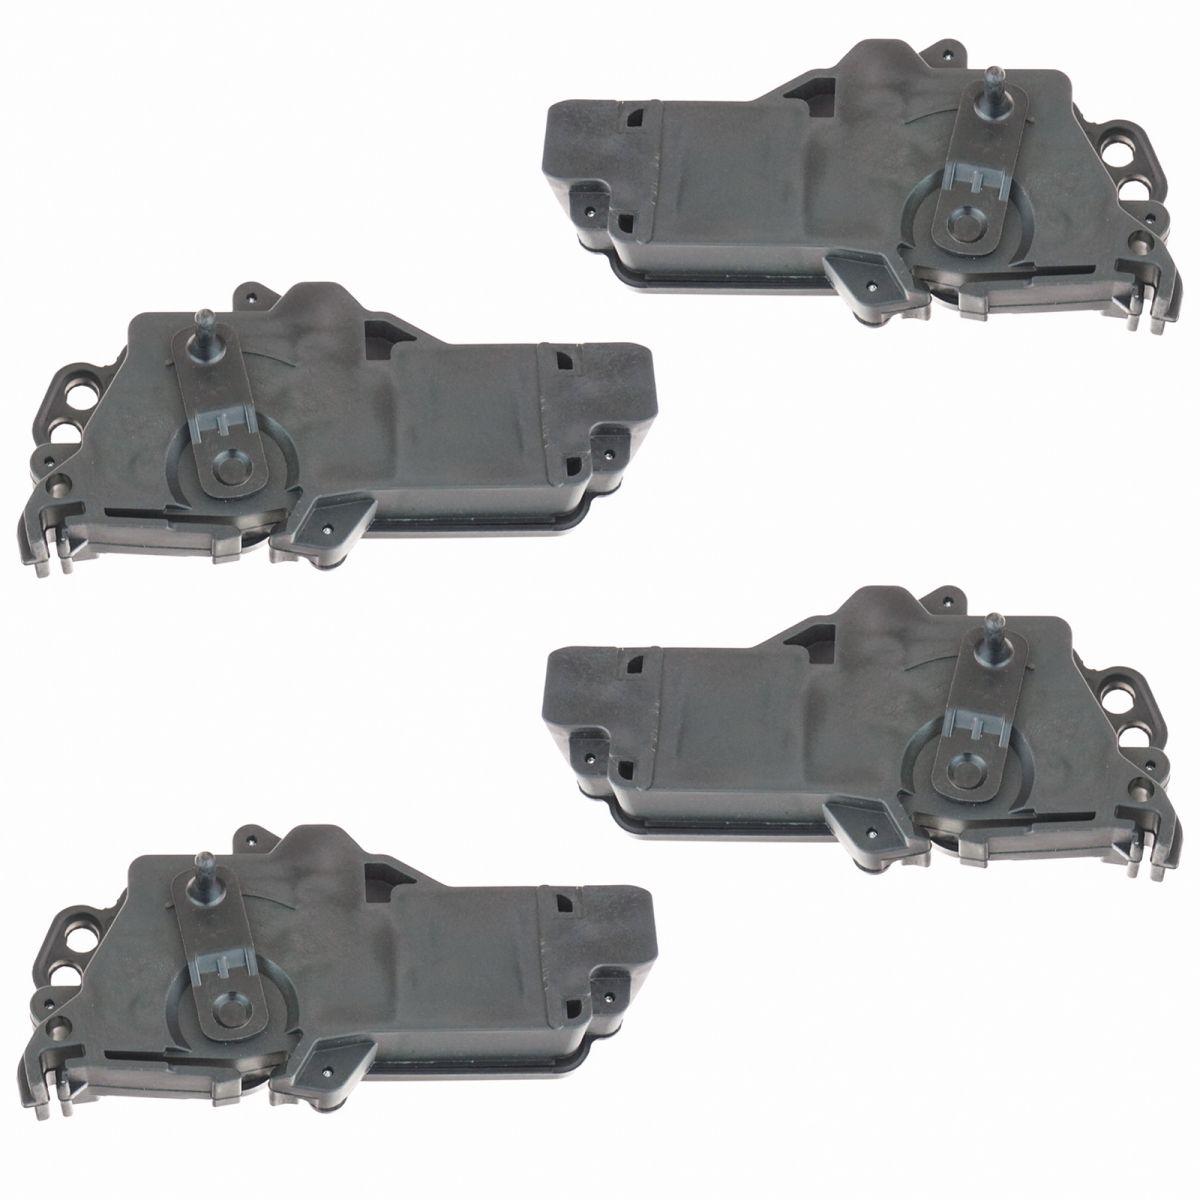 2001 01 Ford F350 Truck Door Lock Actuator Pair NEW